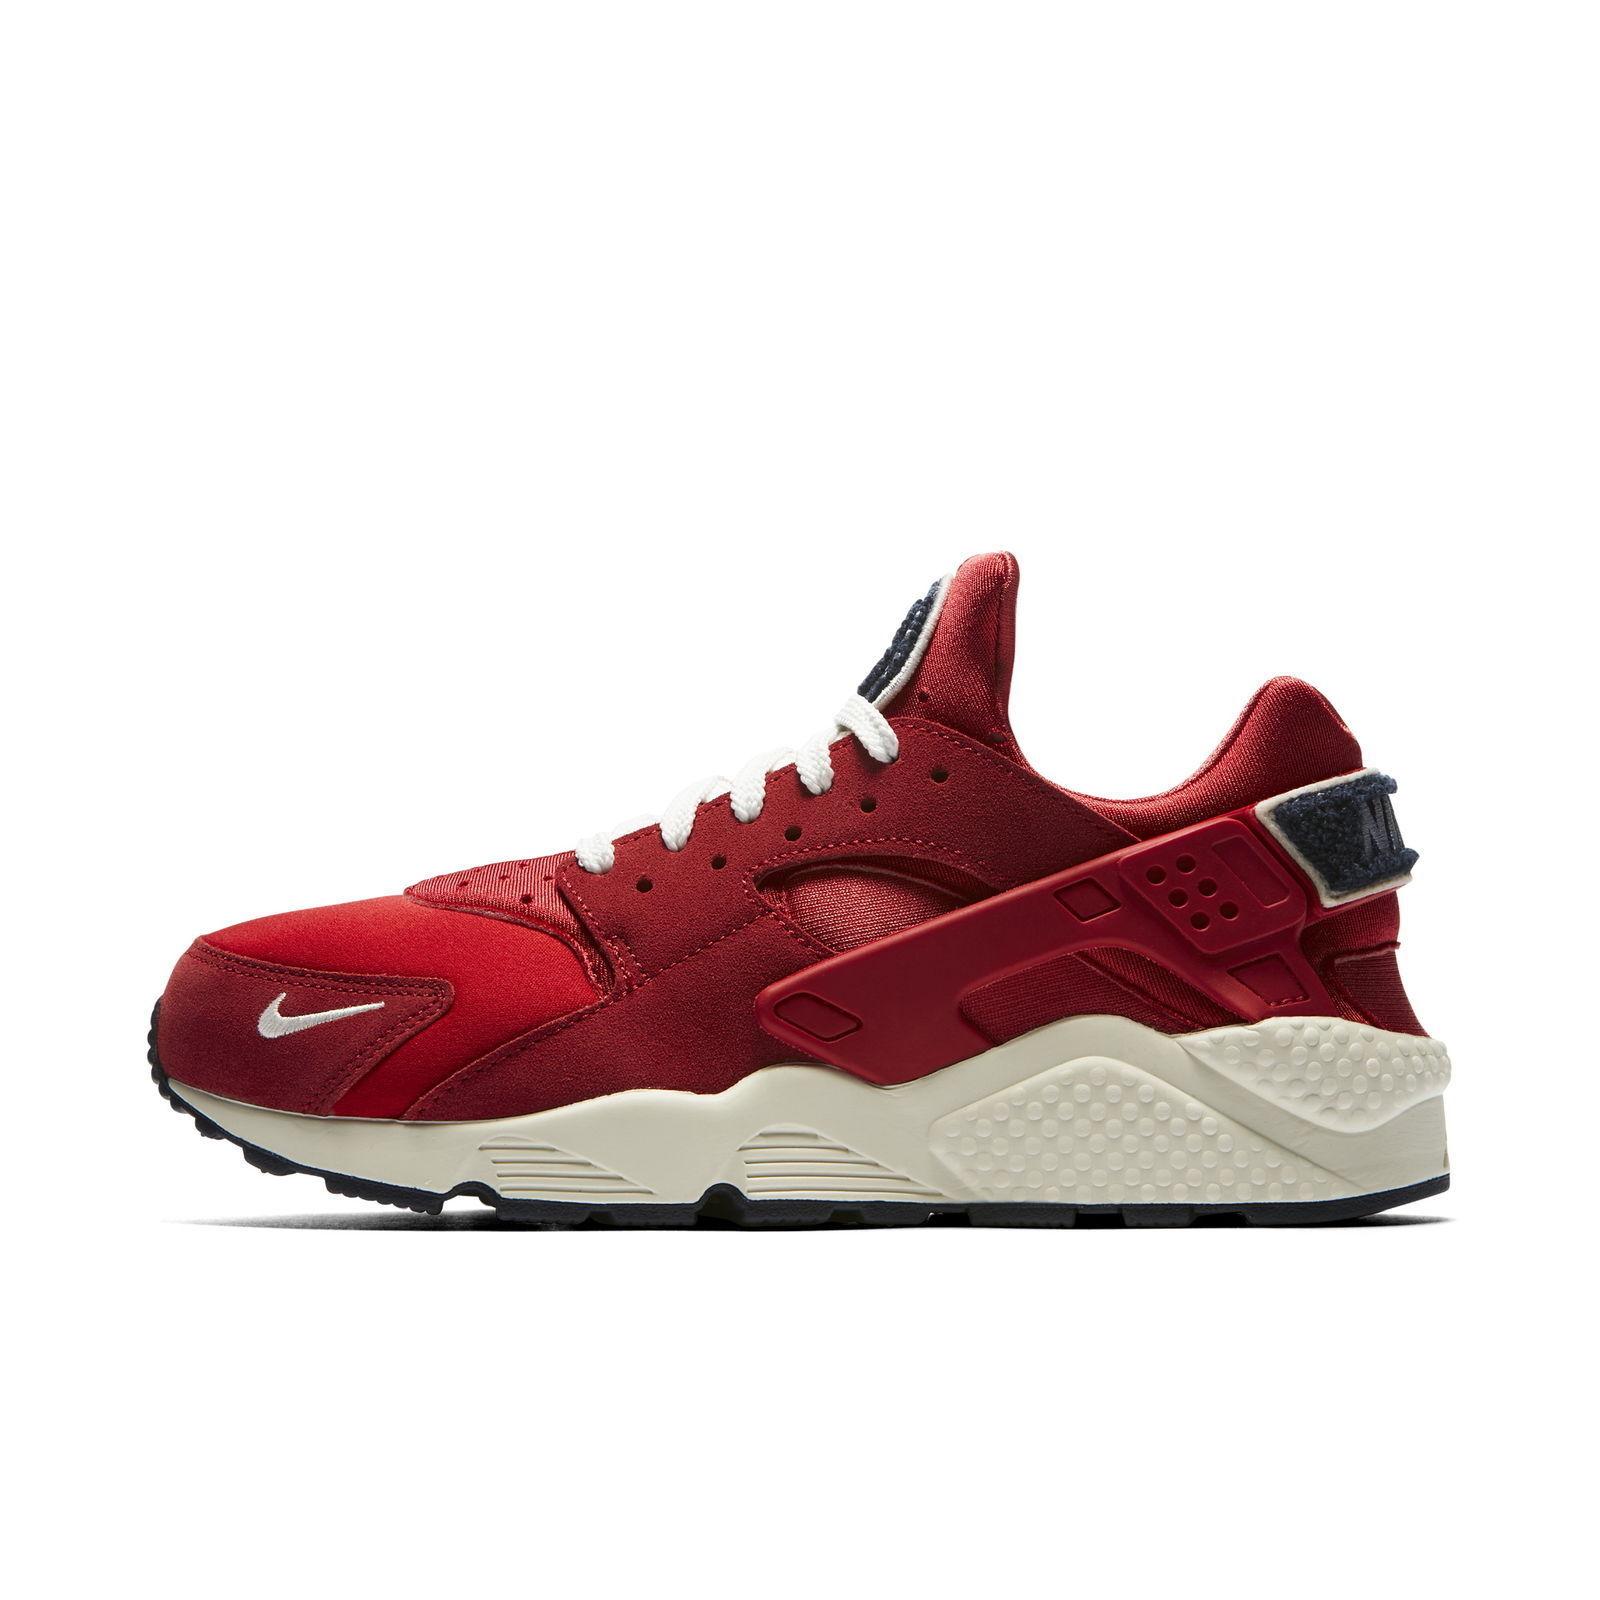 New Run Nike Men's Air Huarache Run New Premium Shoes (704830-602)  University Red 3f6879